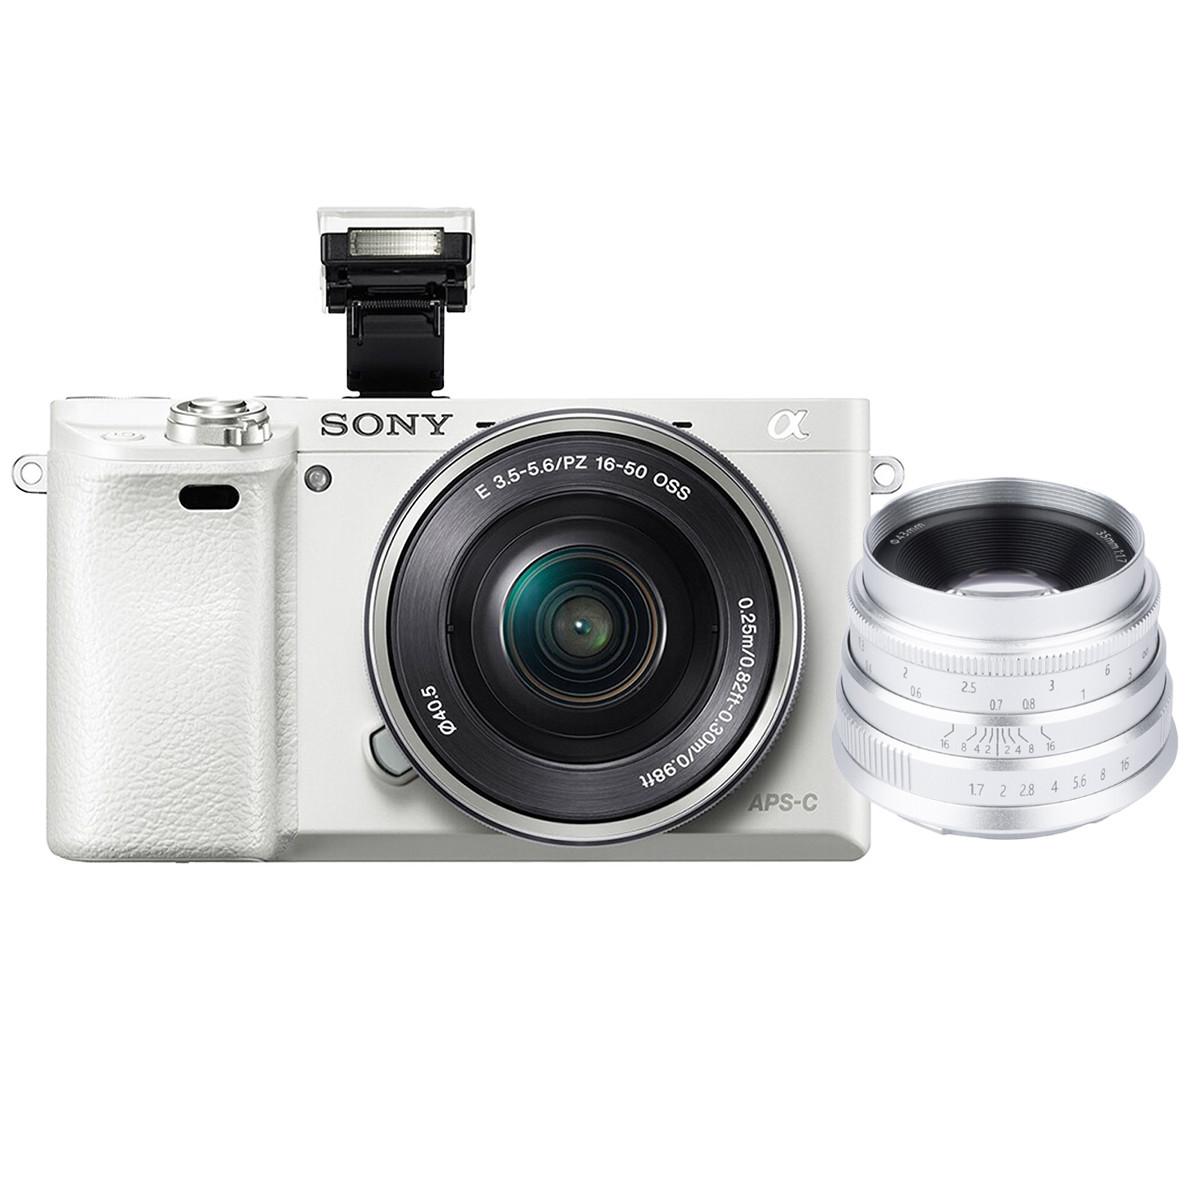 SONY 索尼 A6000 微单单头套机 白色(16-50mm、F3.5-5.6)